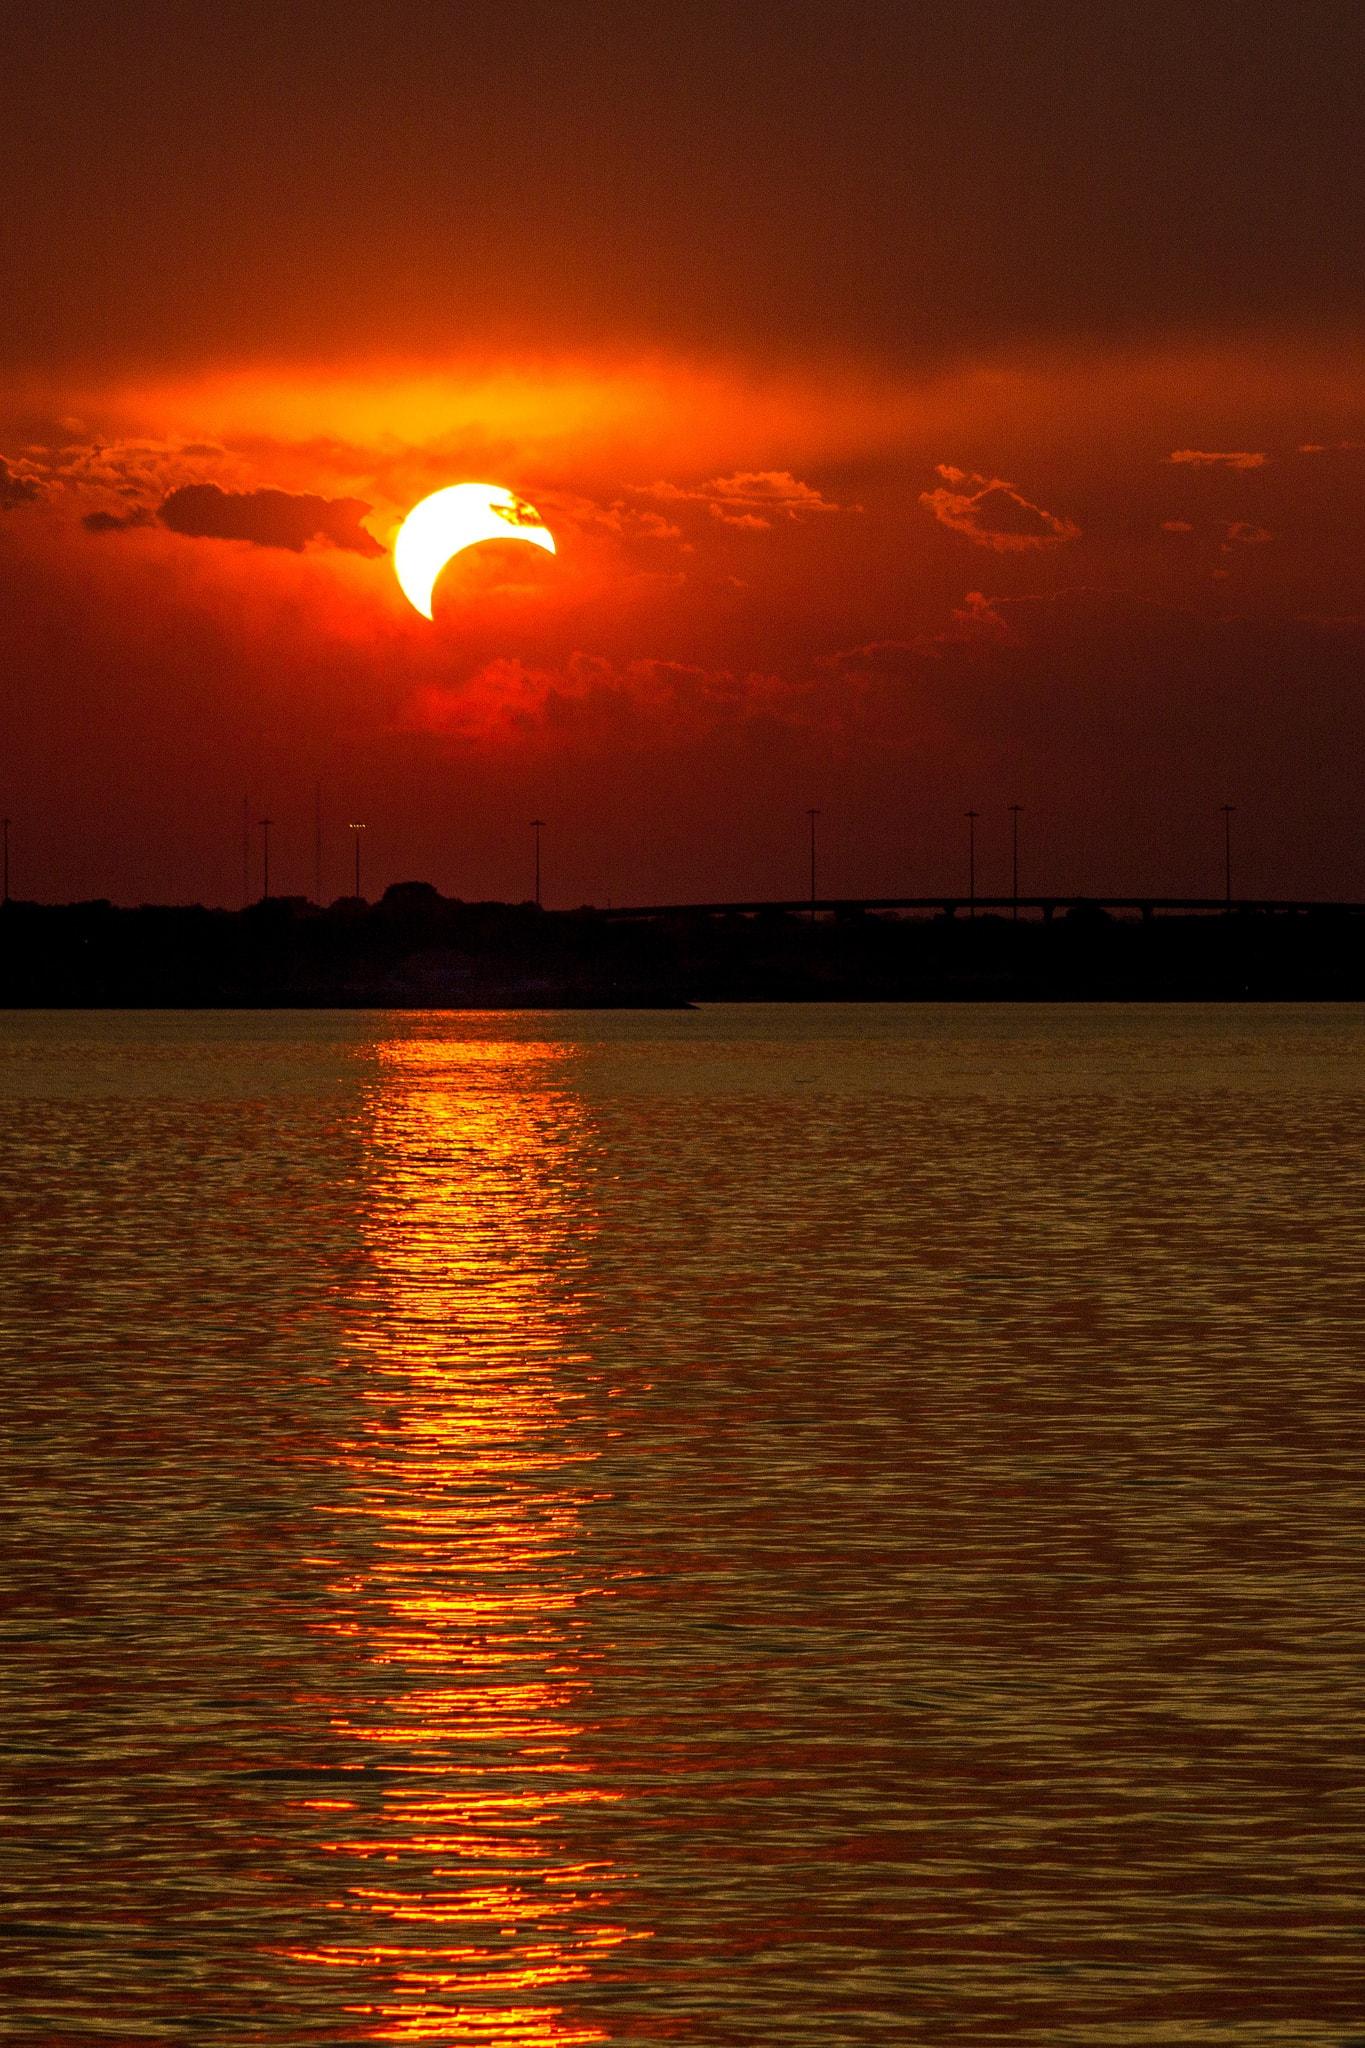 Eclipse fotografiafo por jayRaz